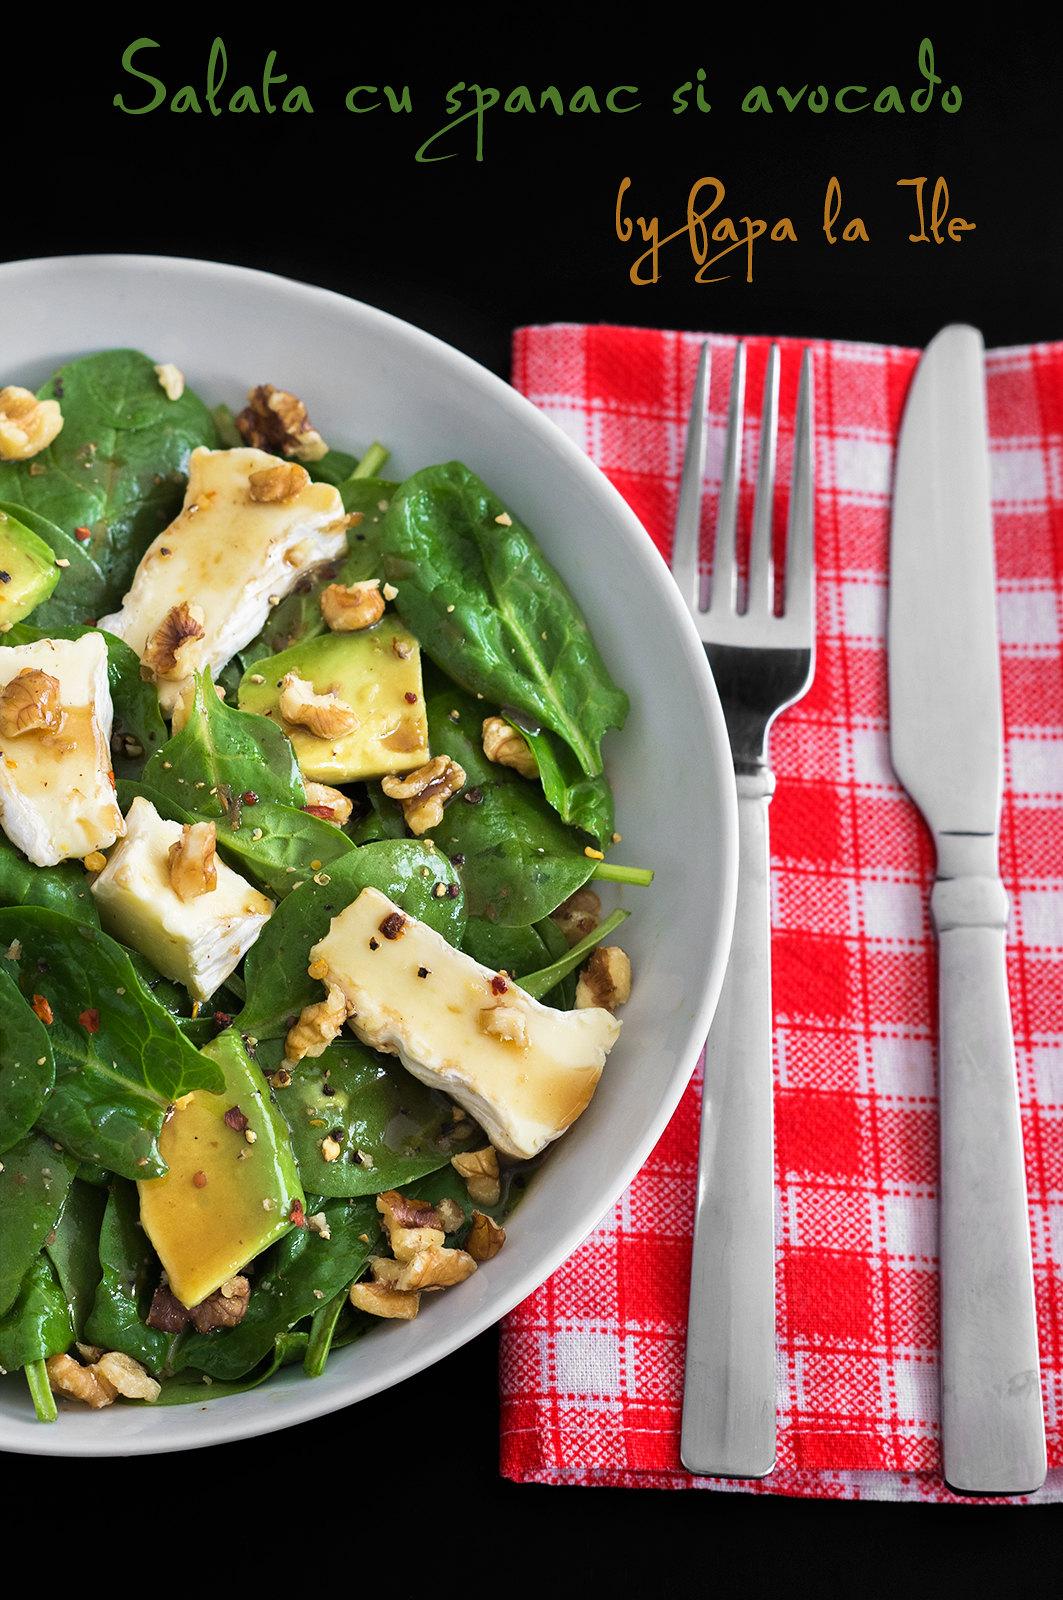 Salata cu spanac si avocado